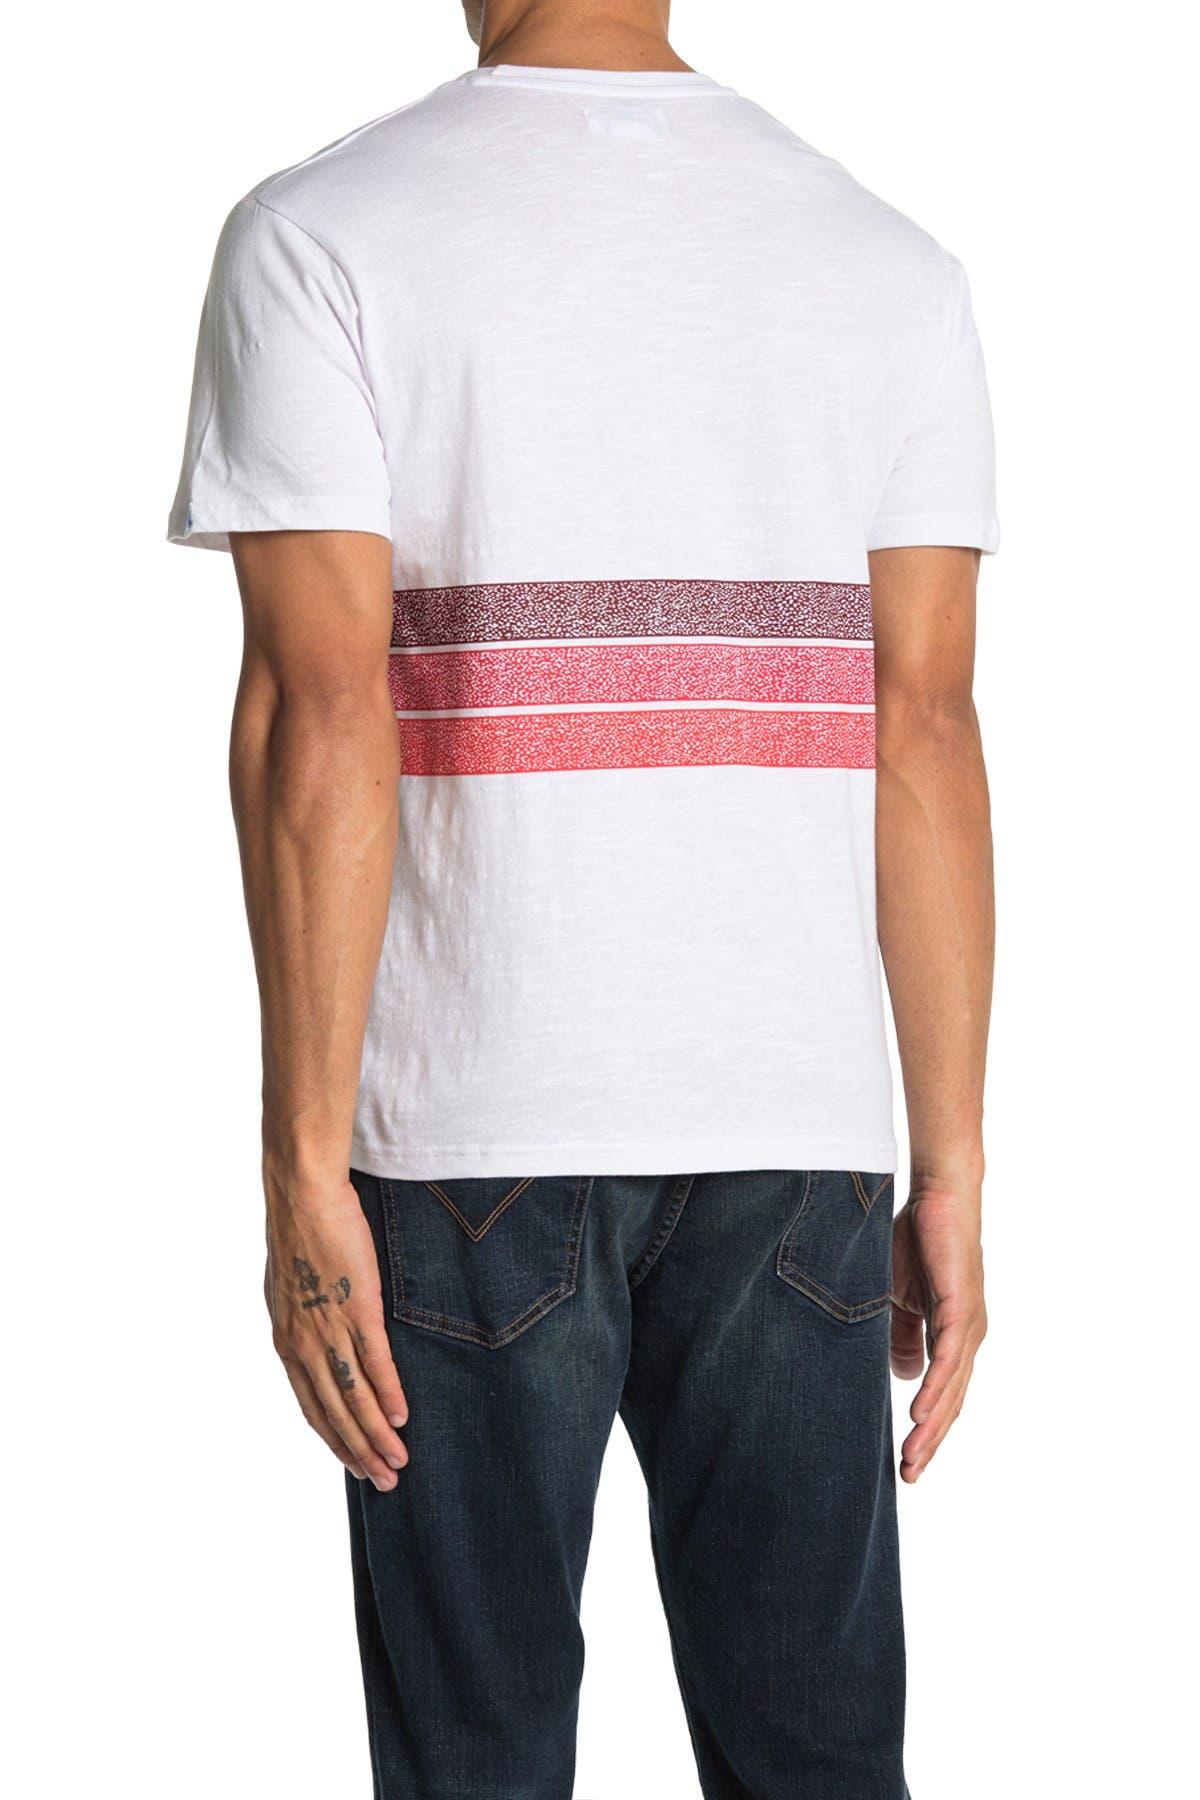 Image of Mr. Swim Hibiscus Stripe Pocket Crew Neck T-Shirt